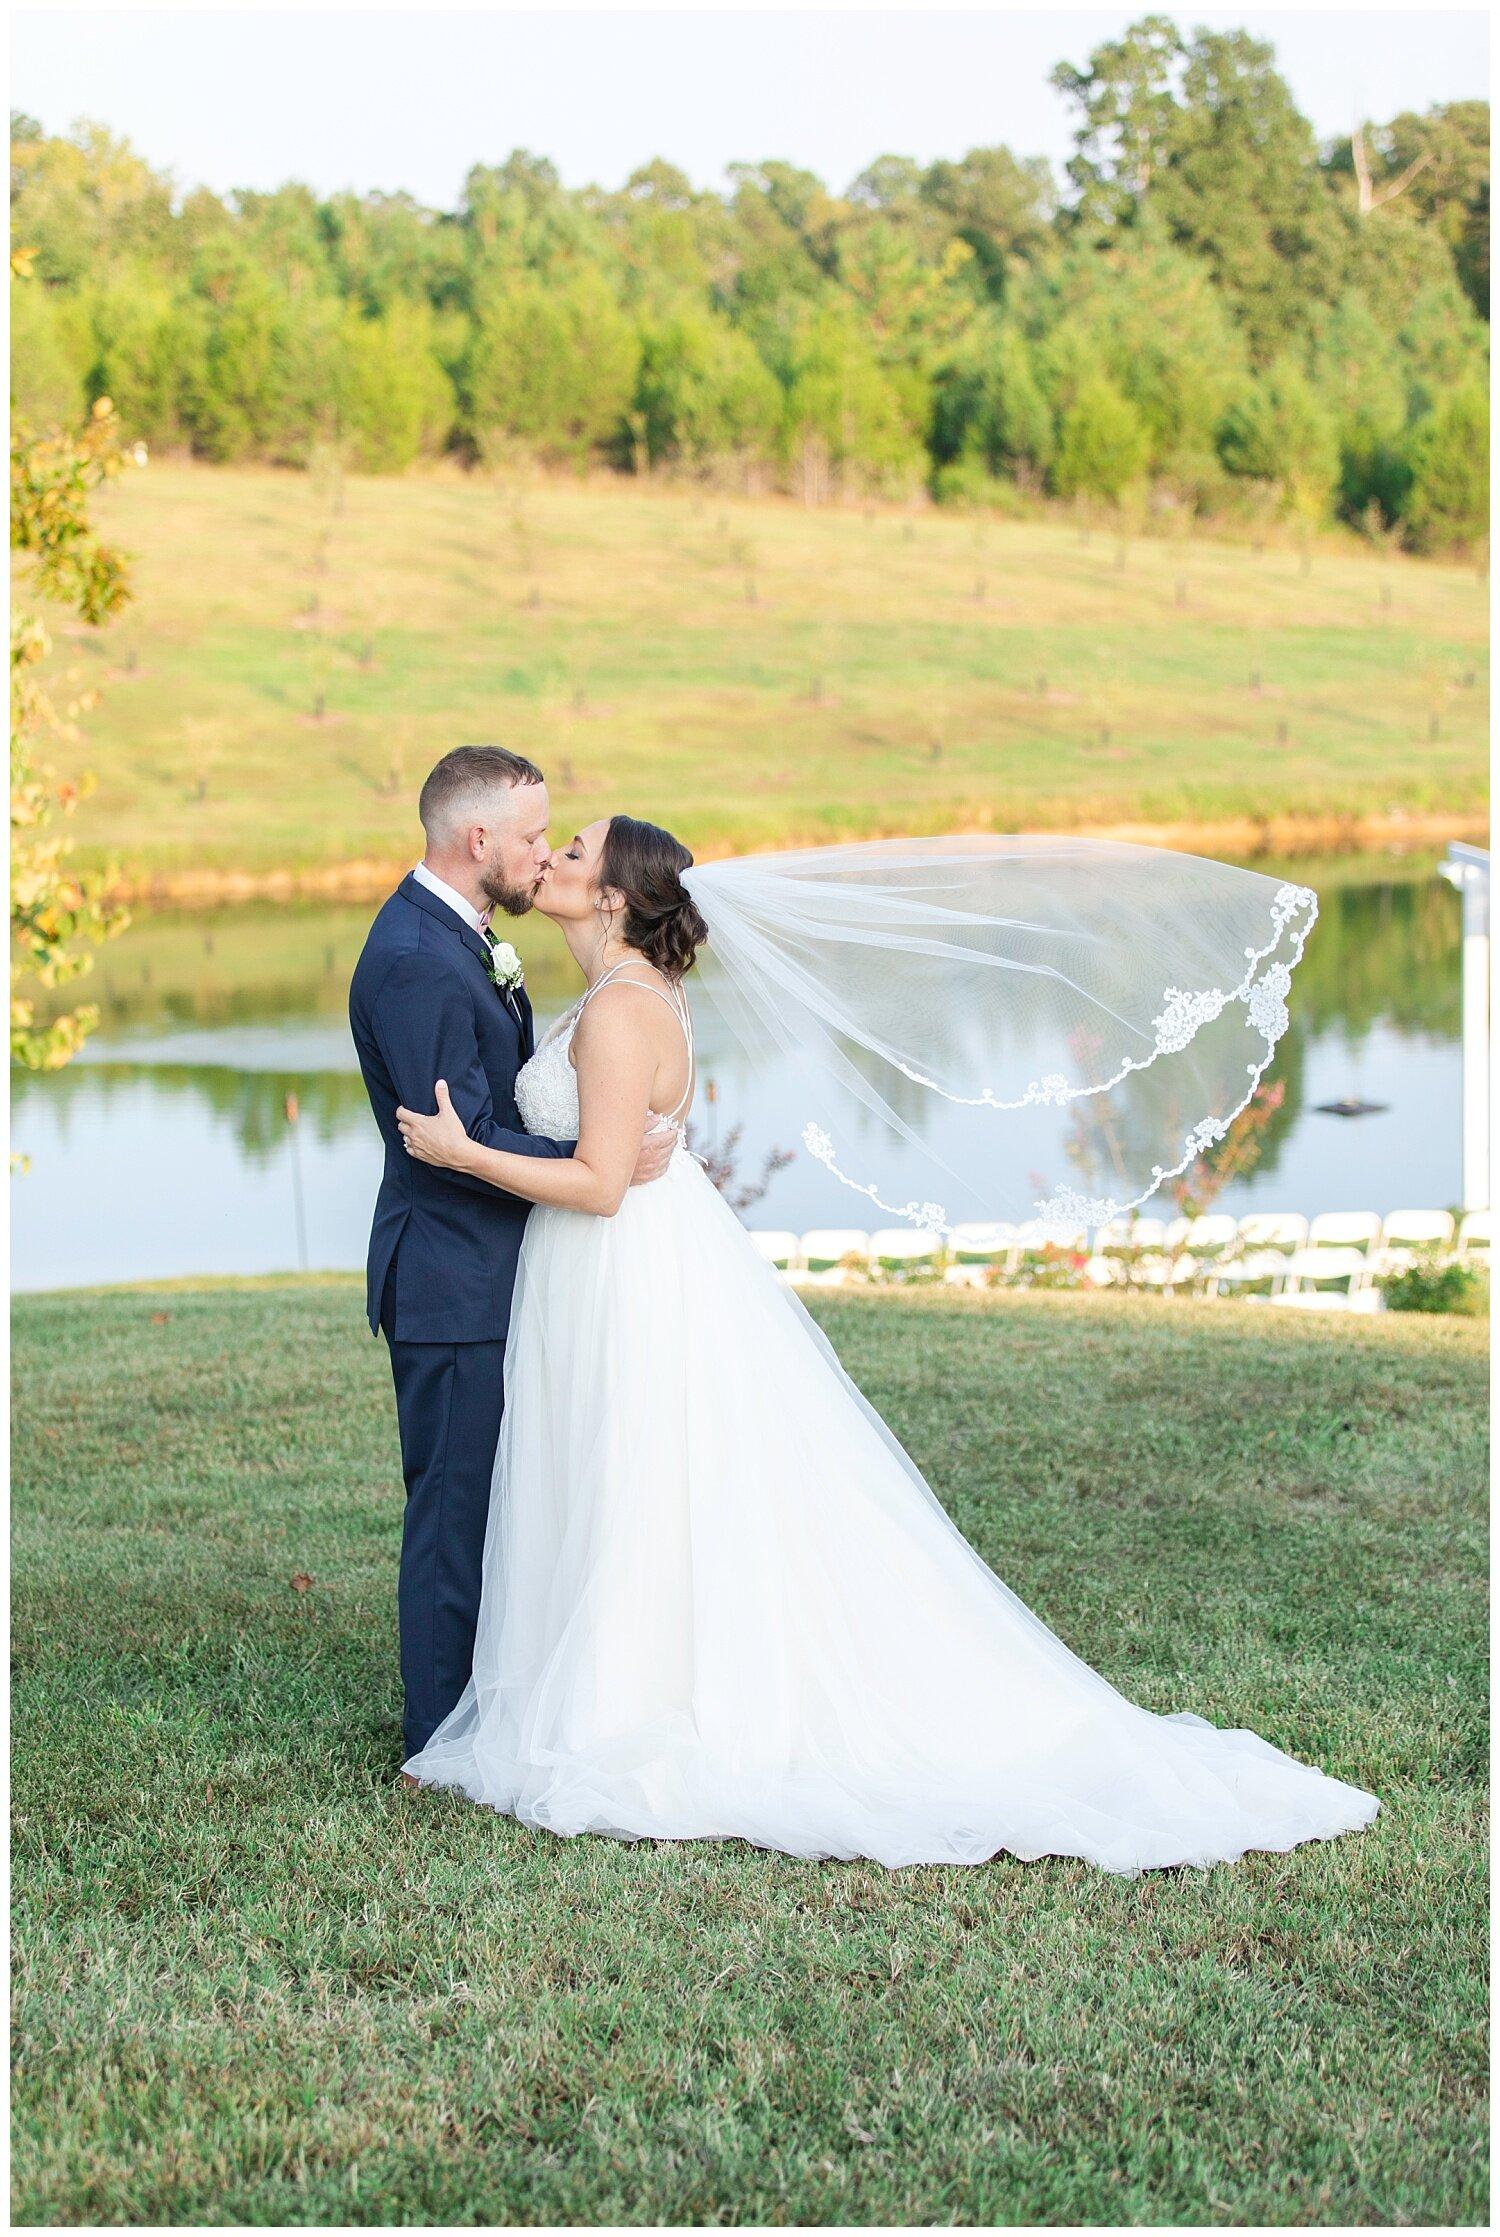 MJMP Richmond VA Wedding Photographer The Venue at Orchard View Farm Wedding Photo_0050.jpg